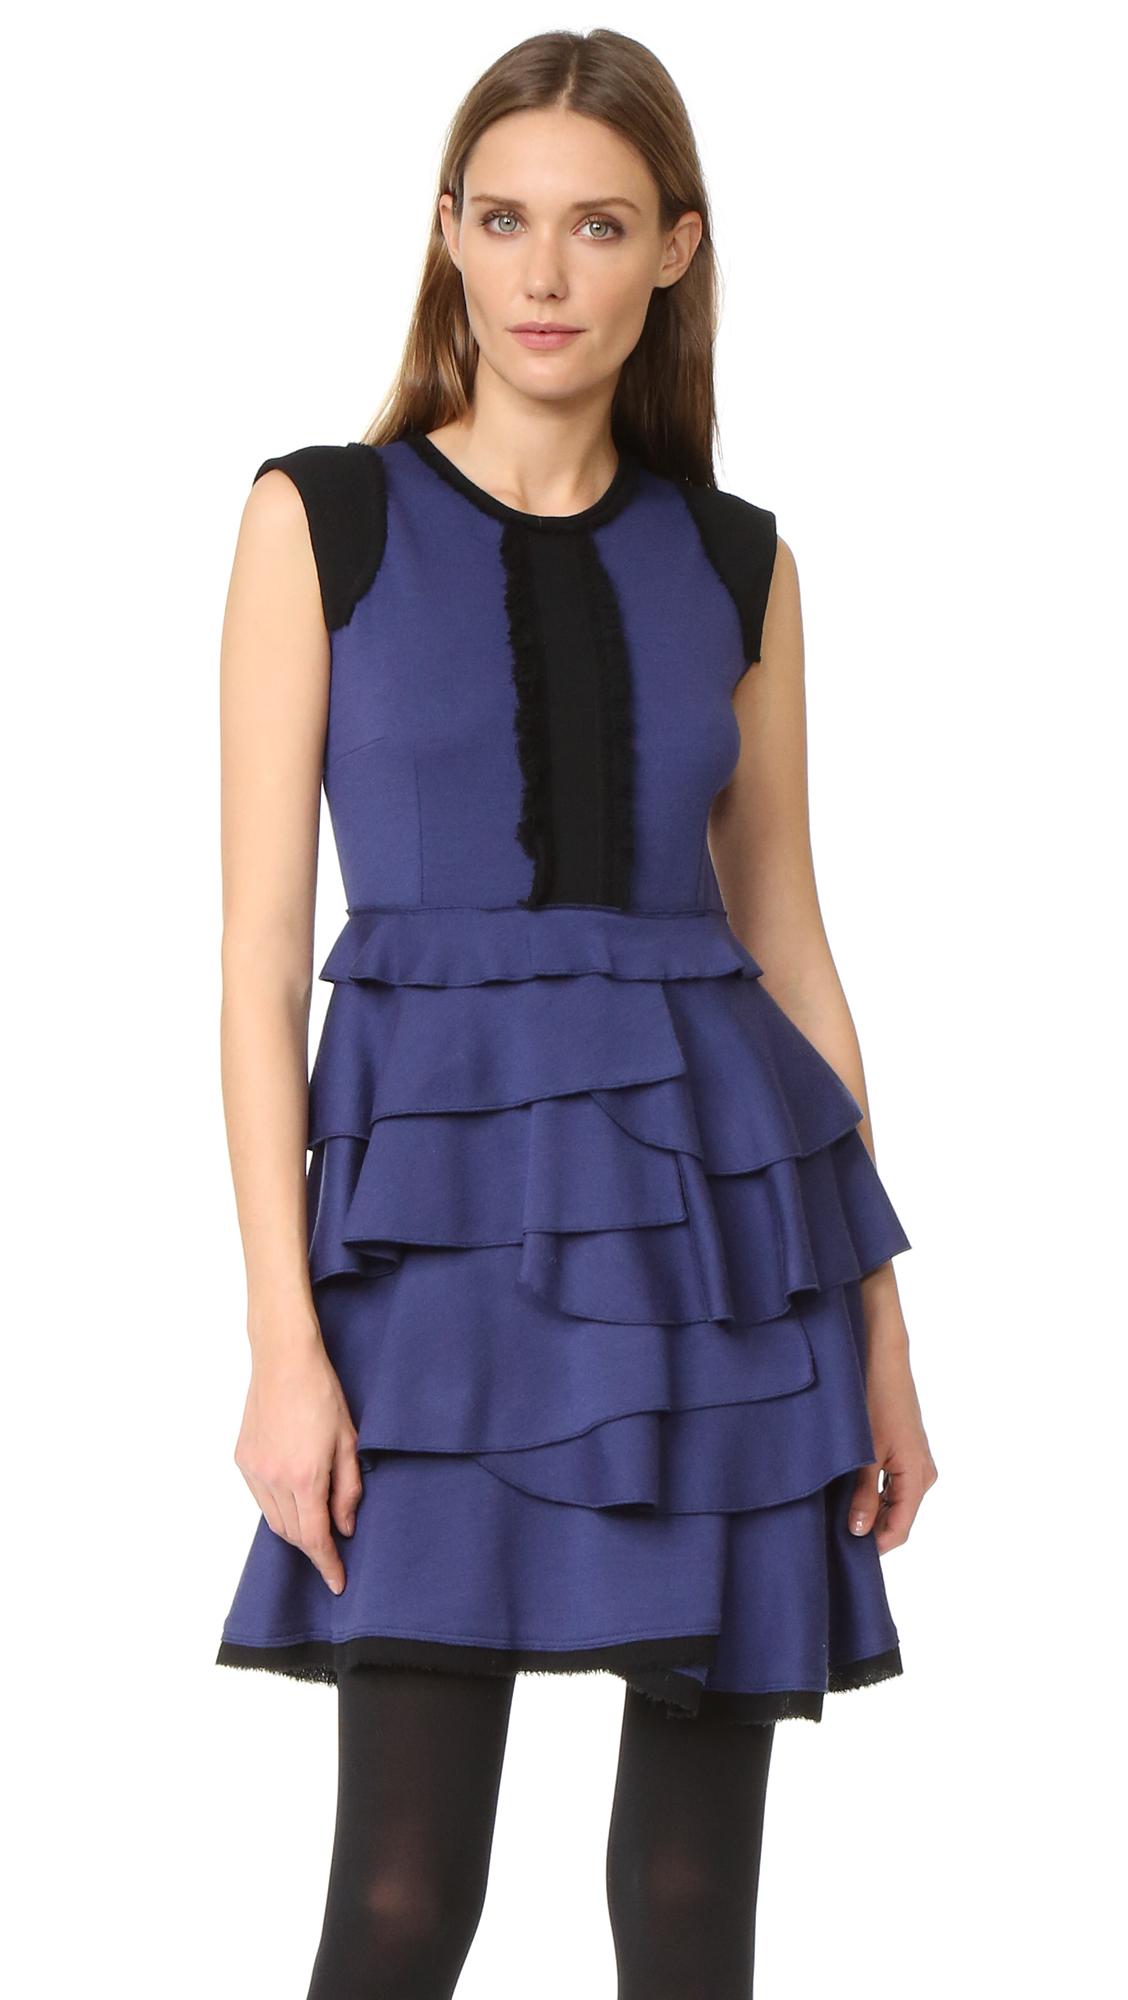 Amelia Toro Sleeveless Ruffle Dress - Blue/Black